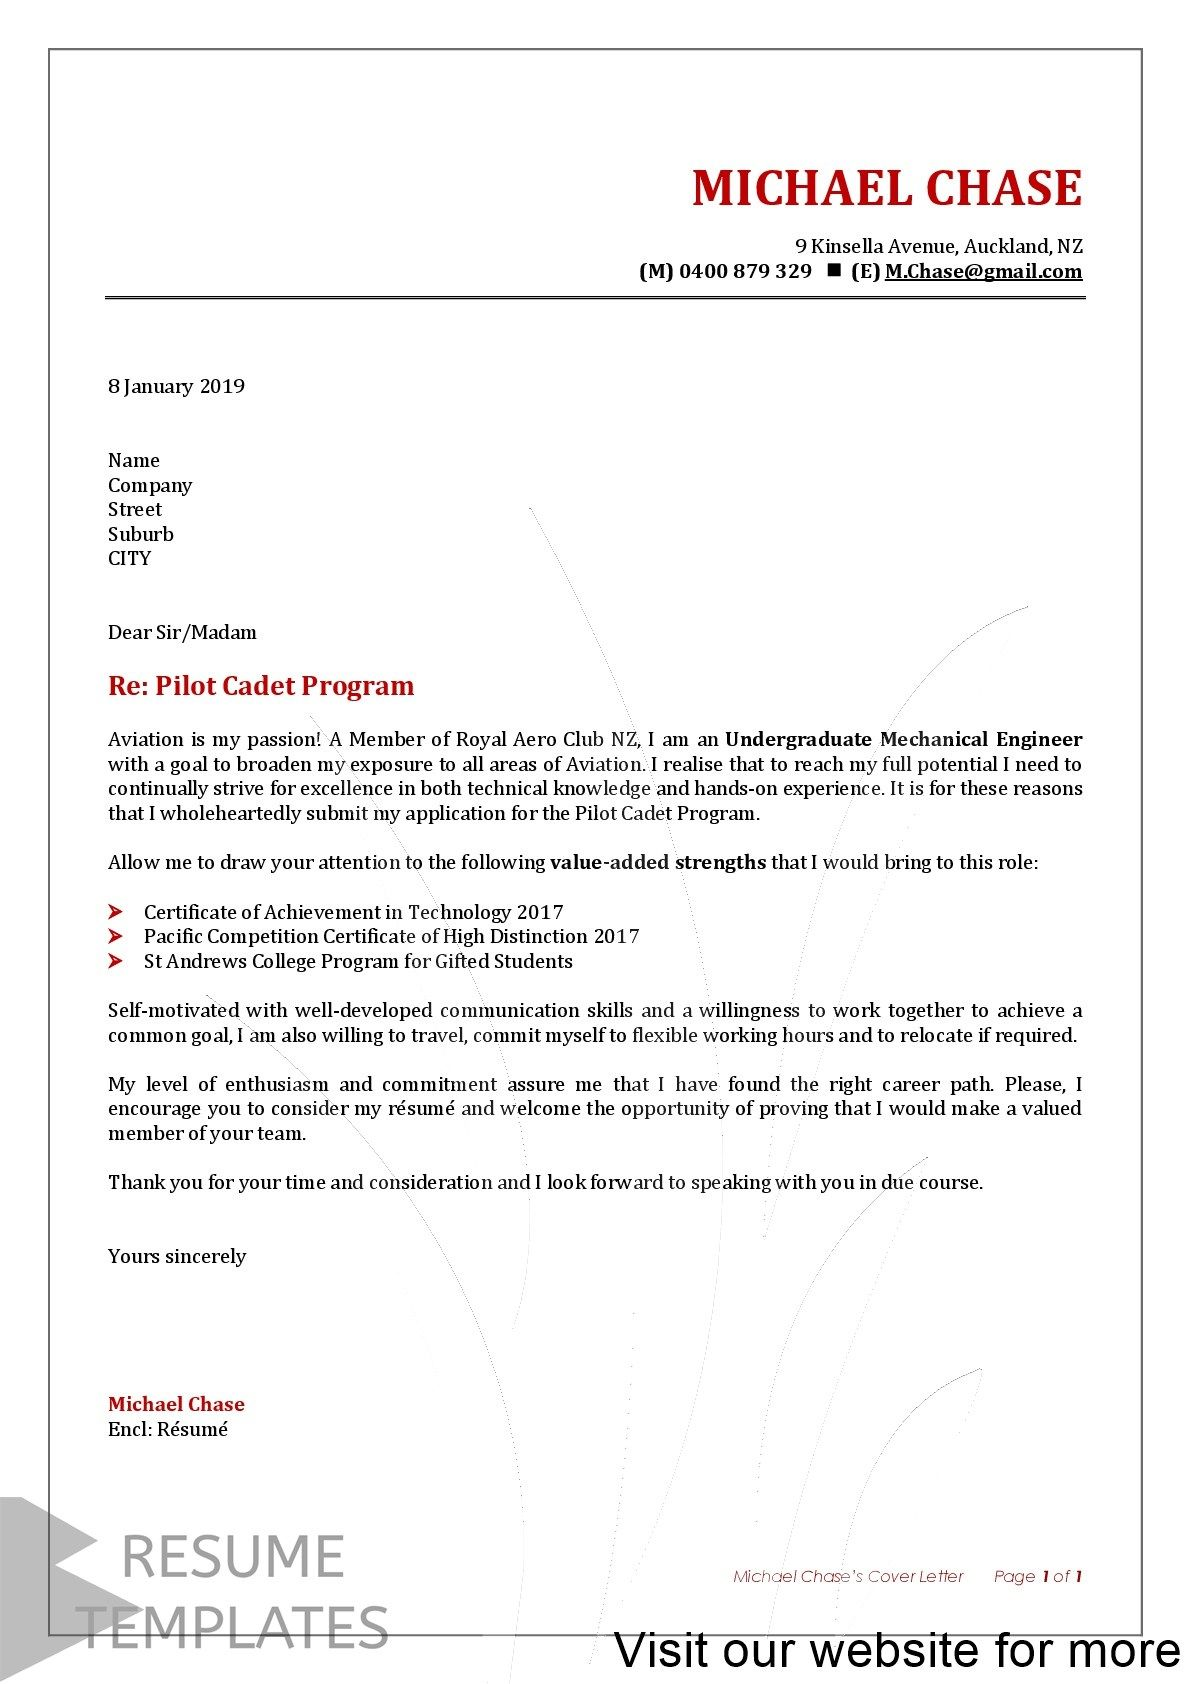 Resume Templates 2020 Free Download